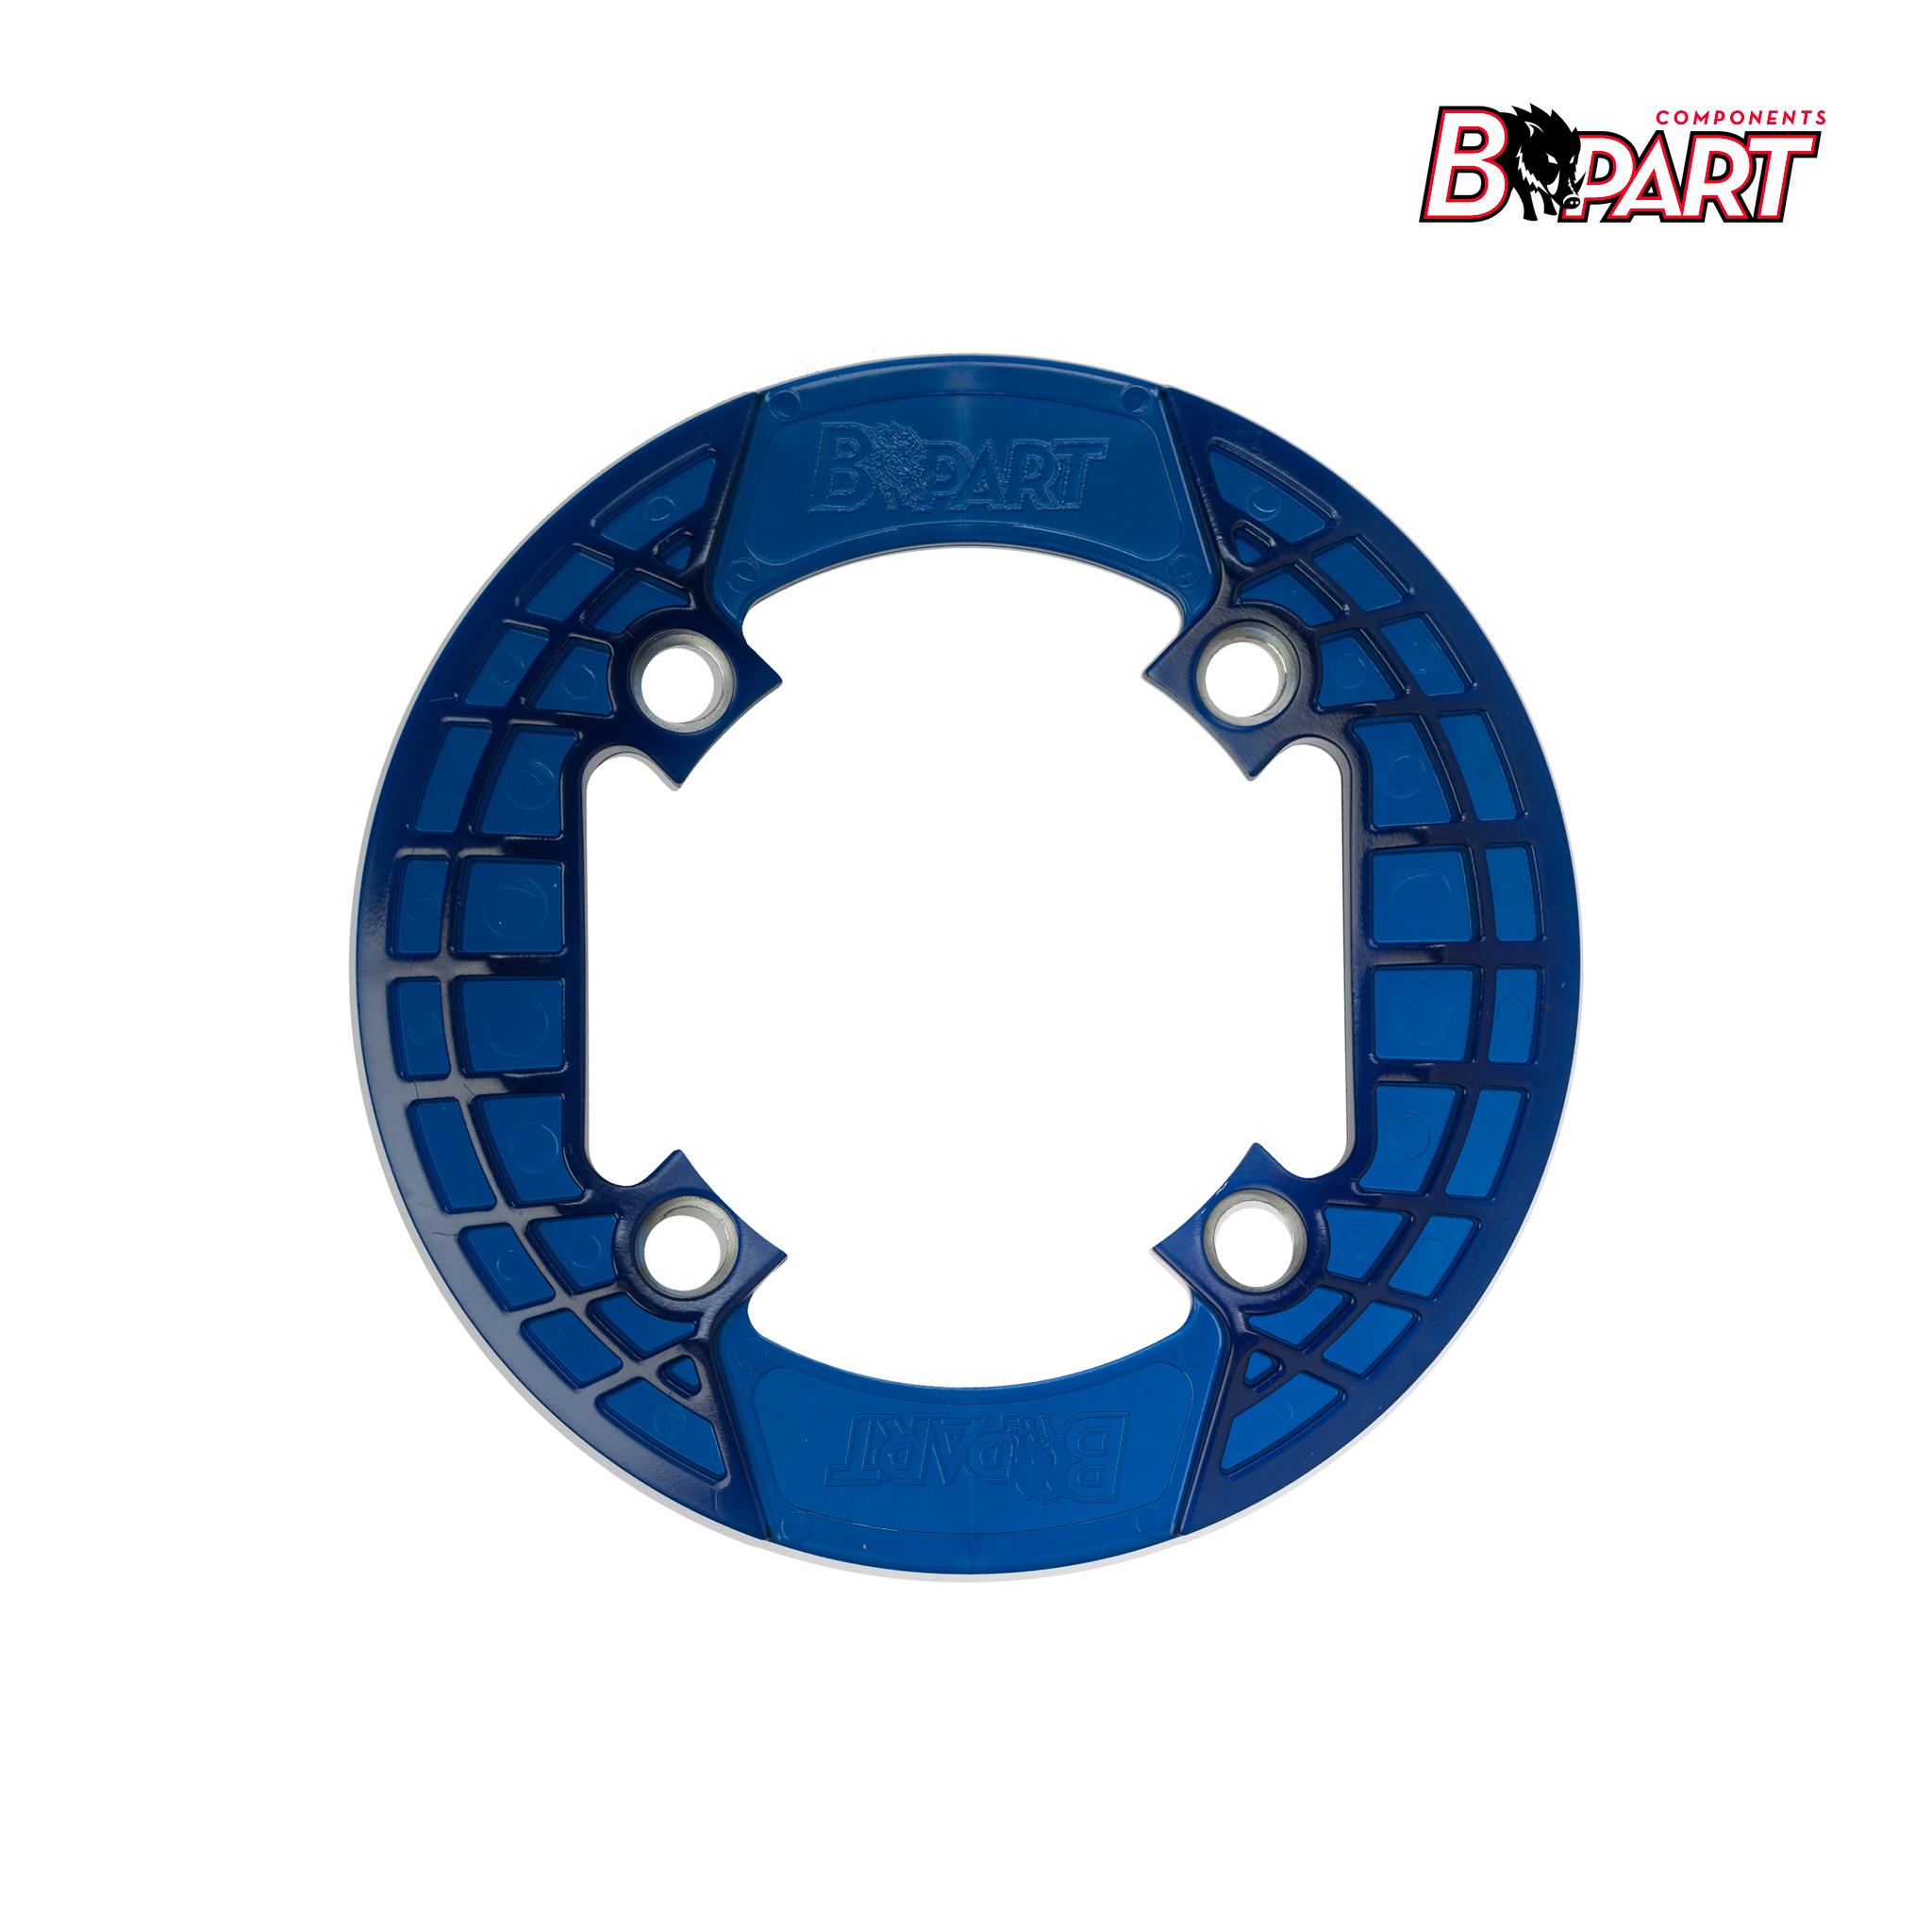 Bpart Components cubreplatos azul traslucido